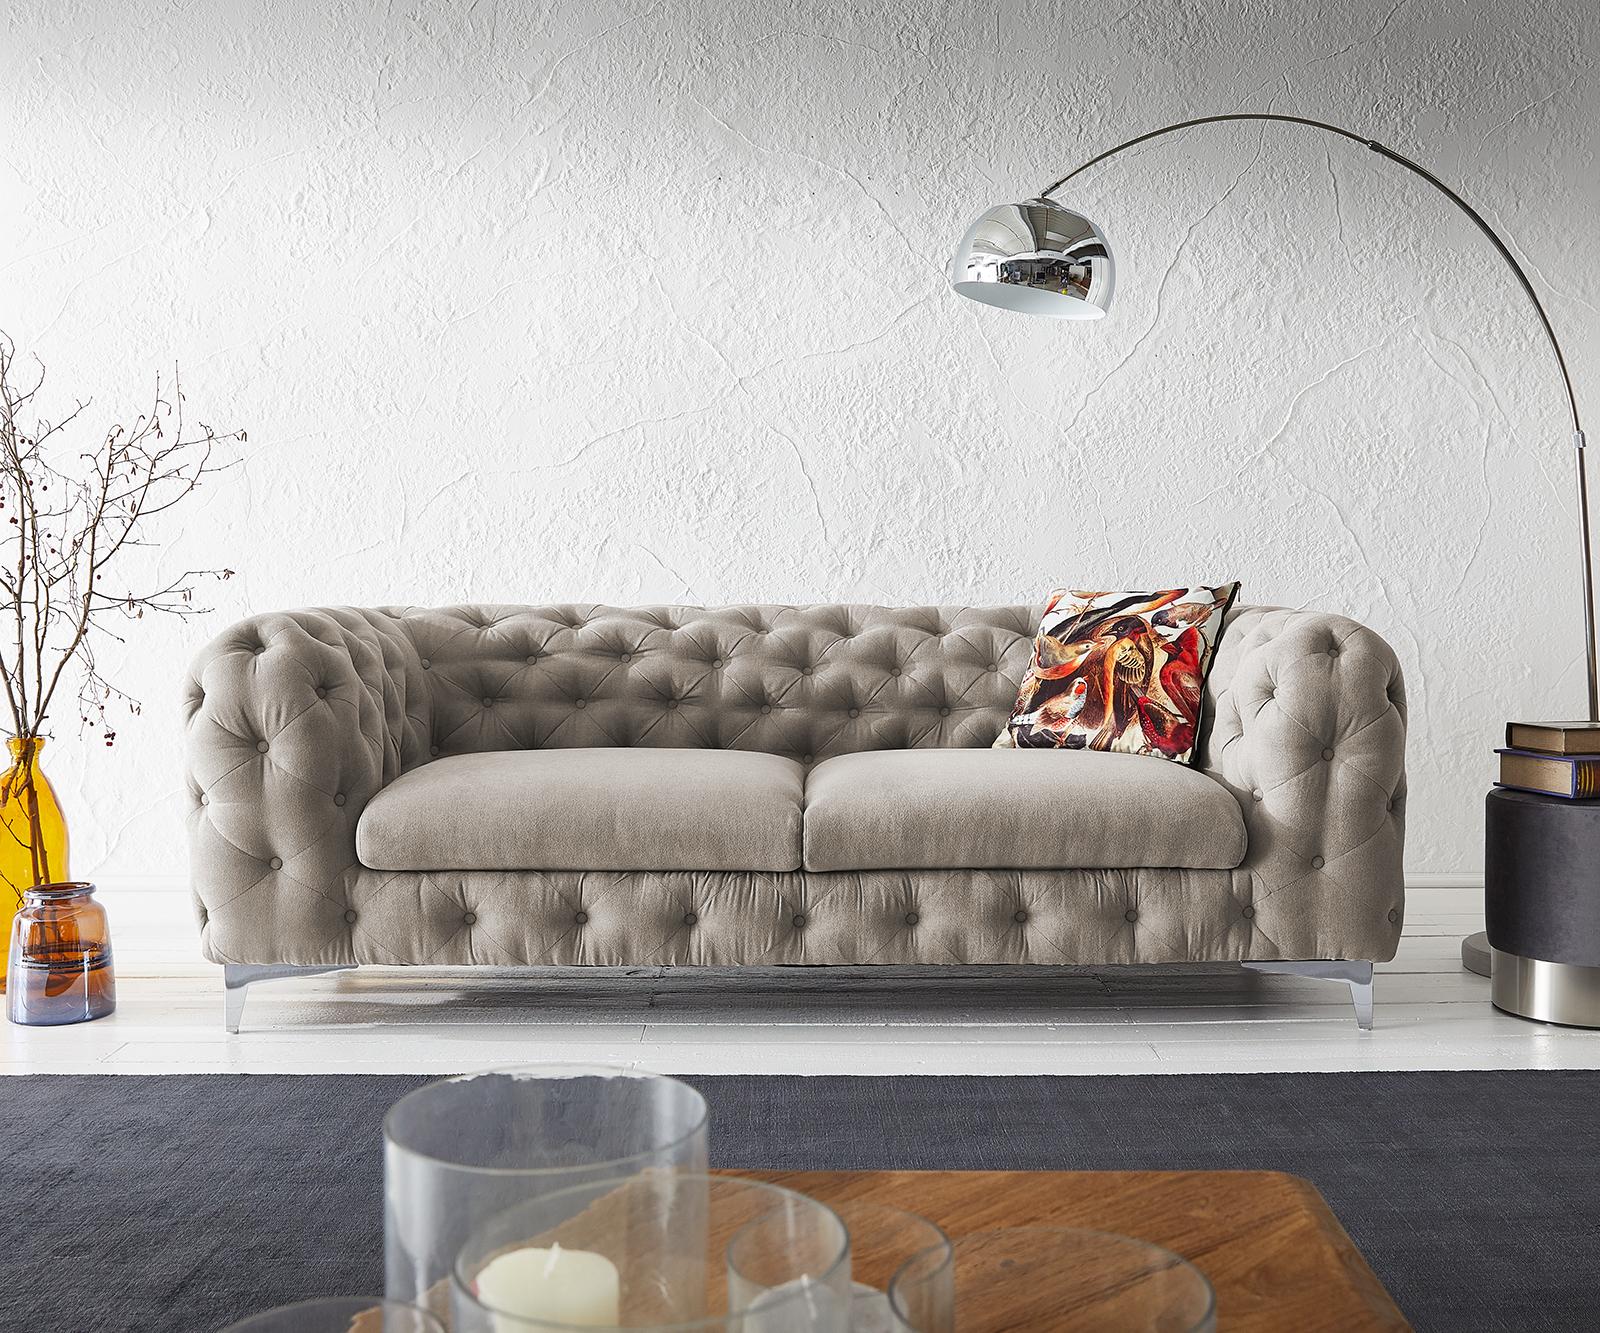 Couch Corleone 225x97 cm Beige 3-Sitzer Sofa